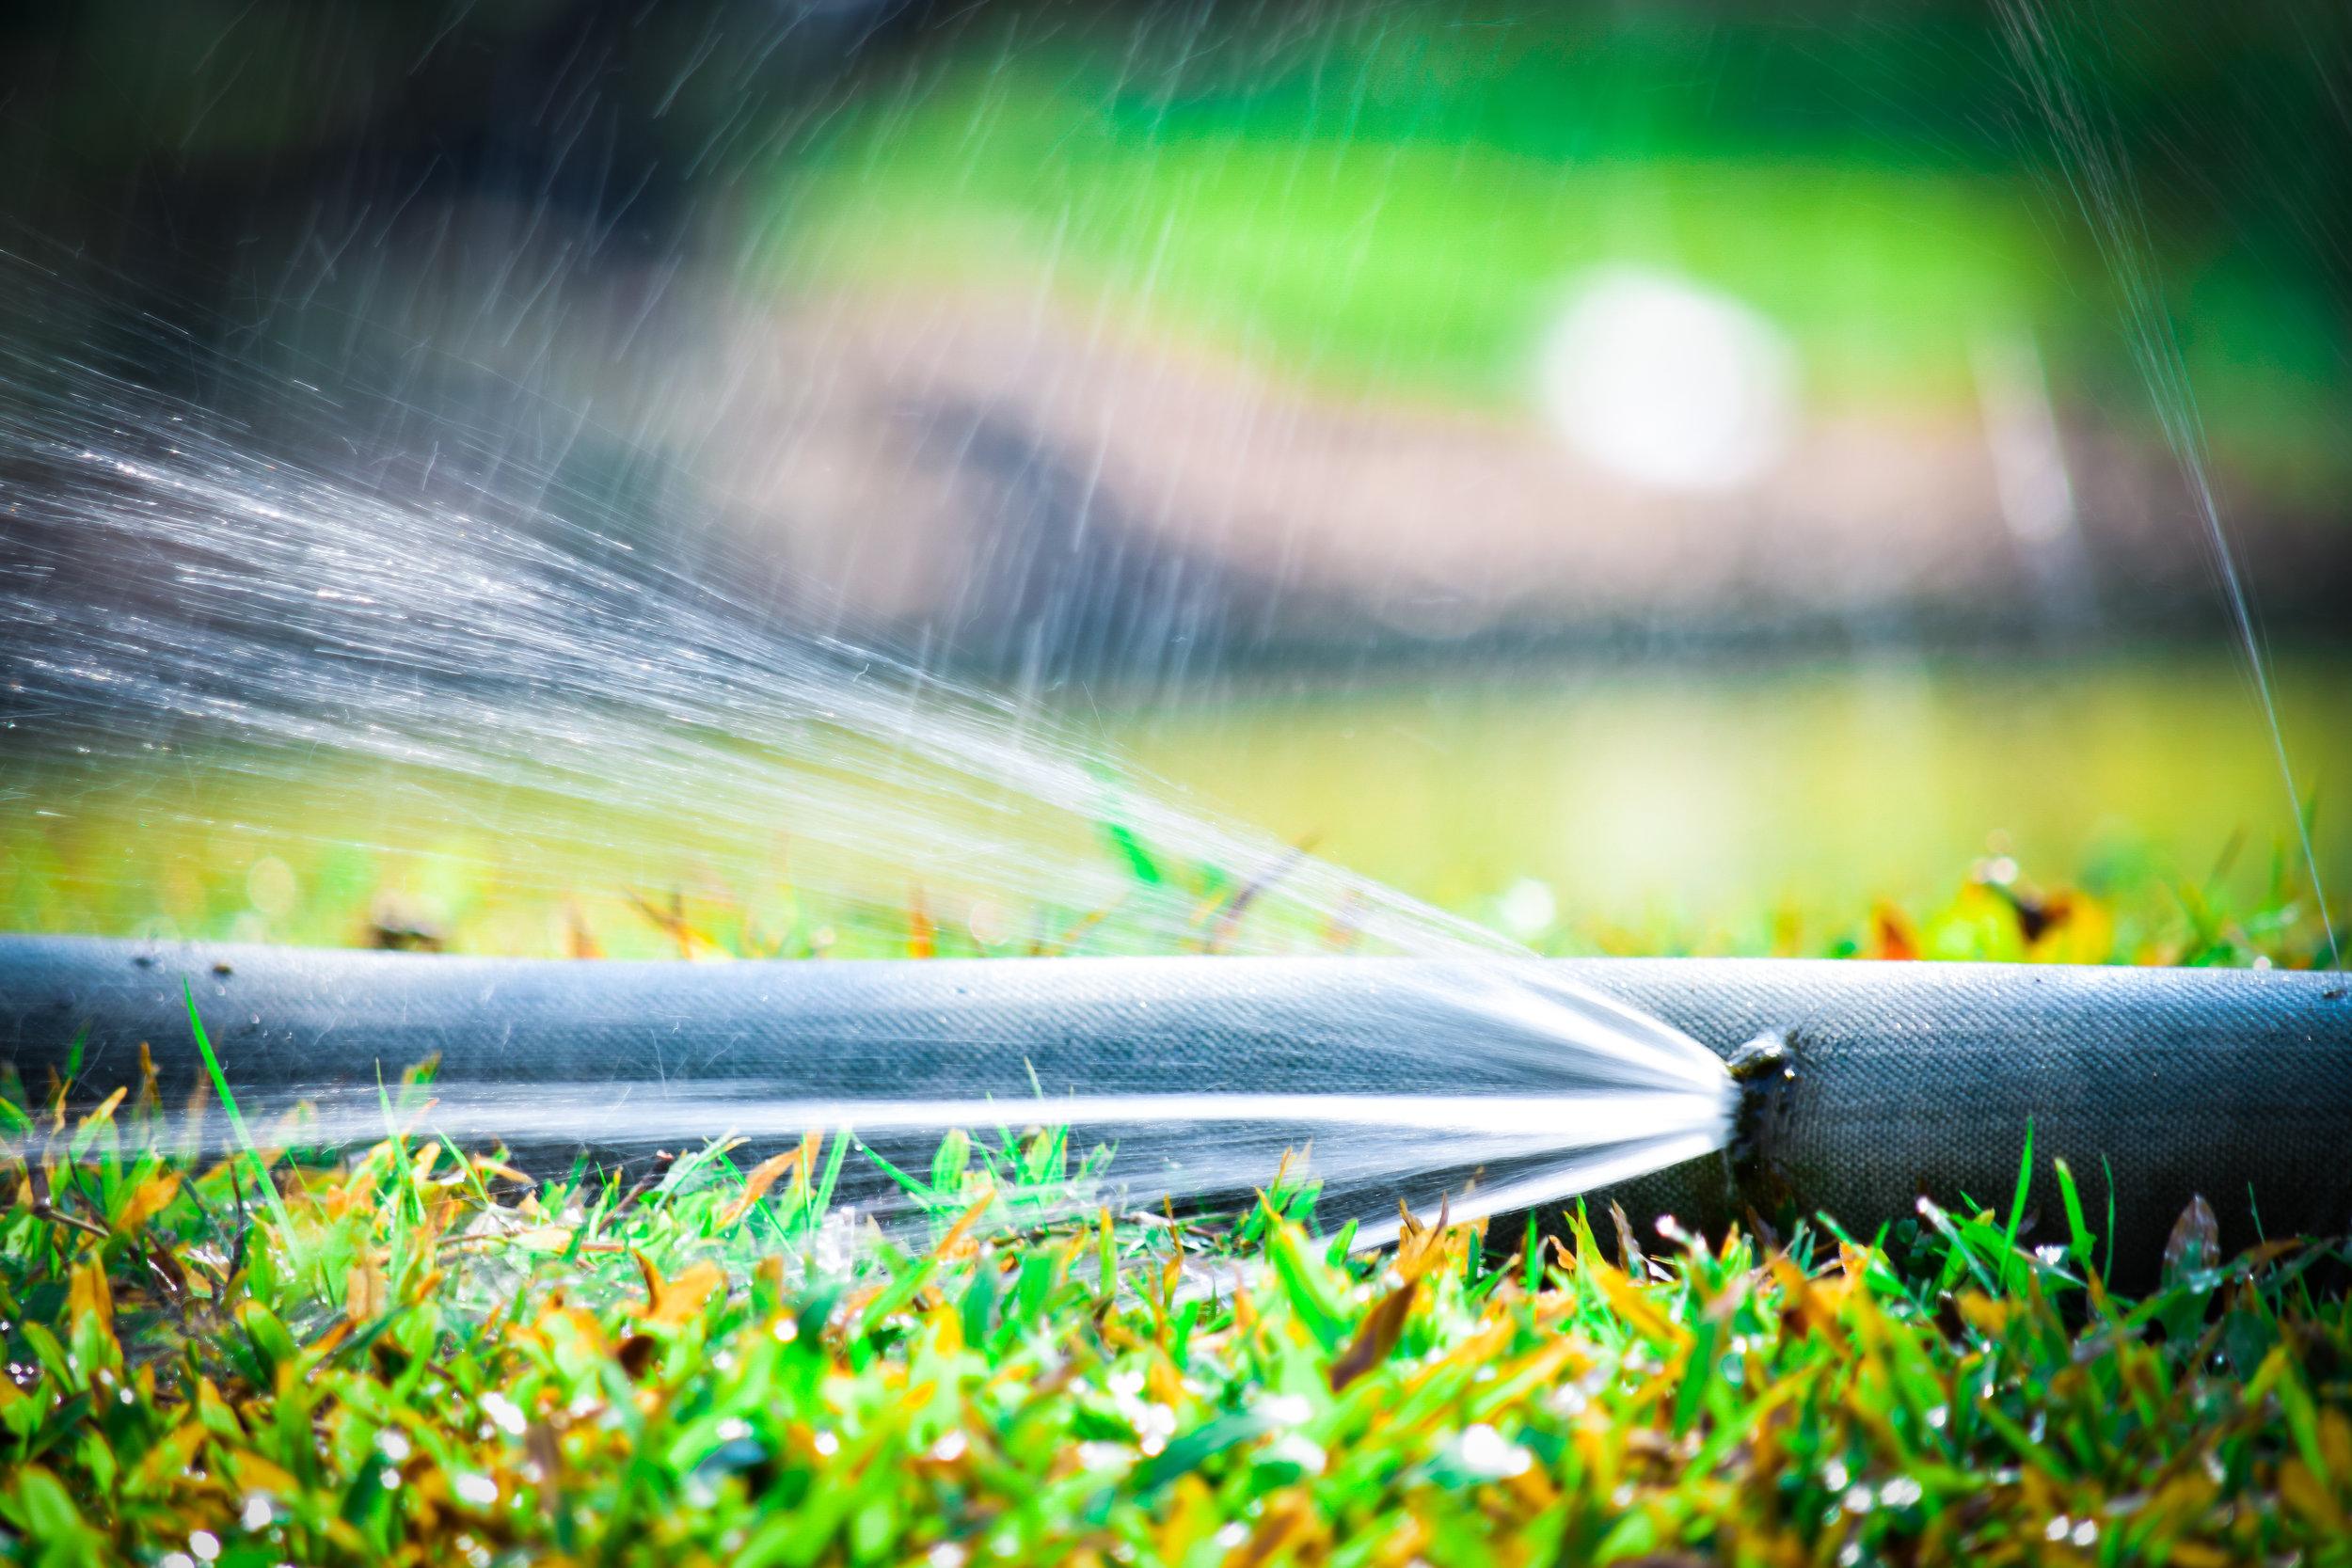 Hose Irrigation Malawi Furrow Irrigation Basin Irrigation Crop Irrigation